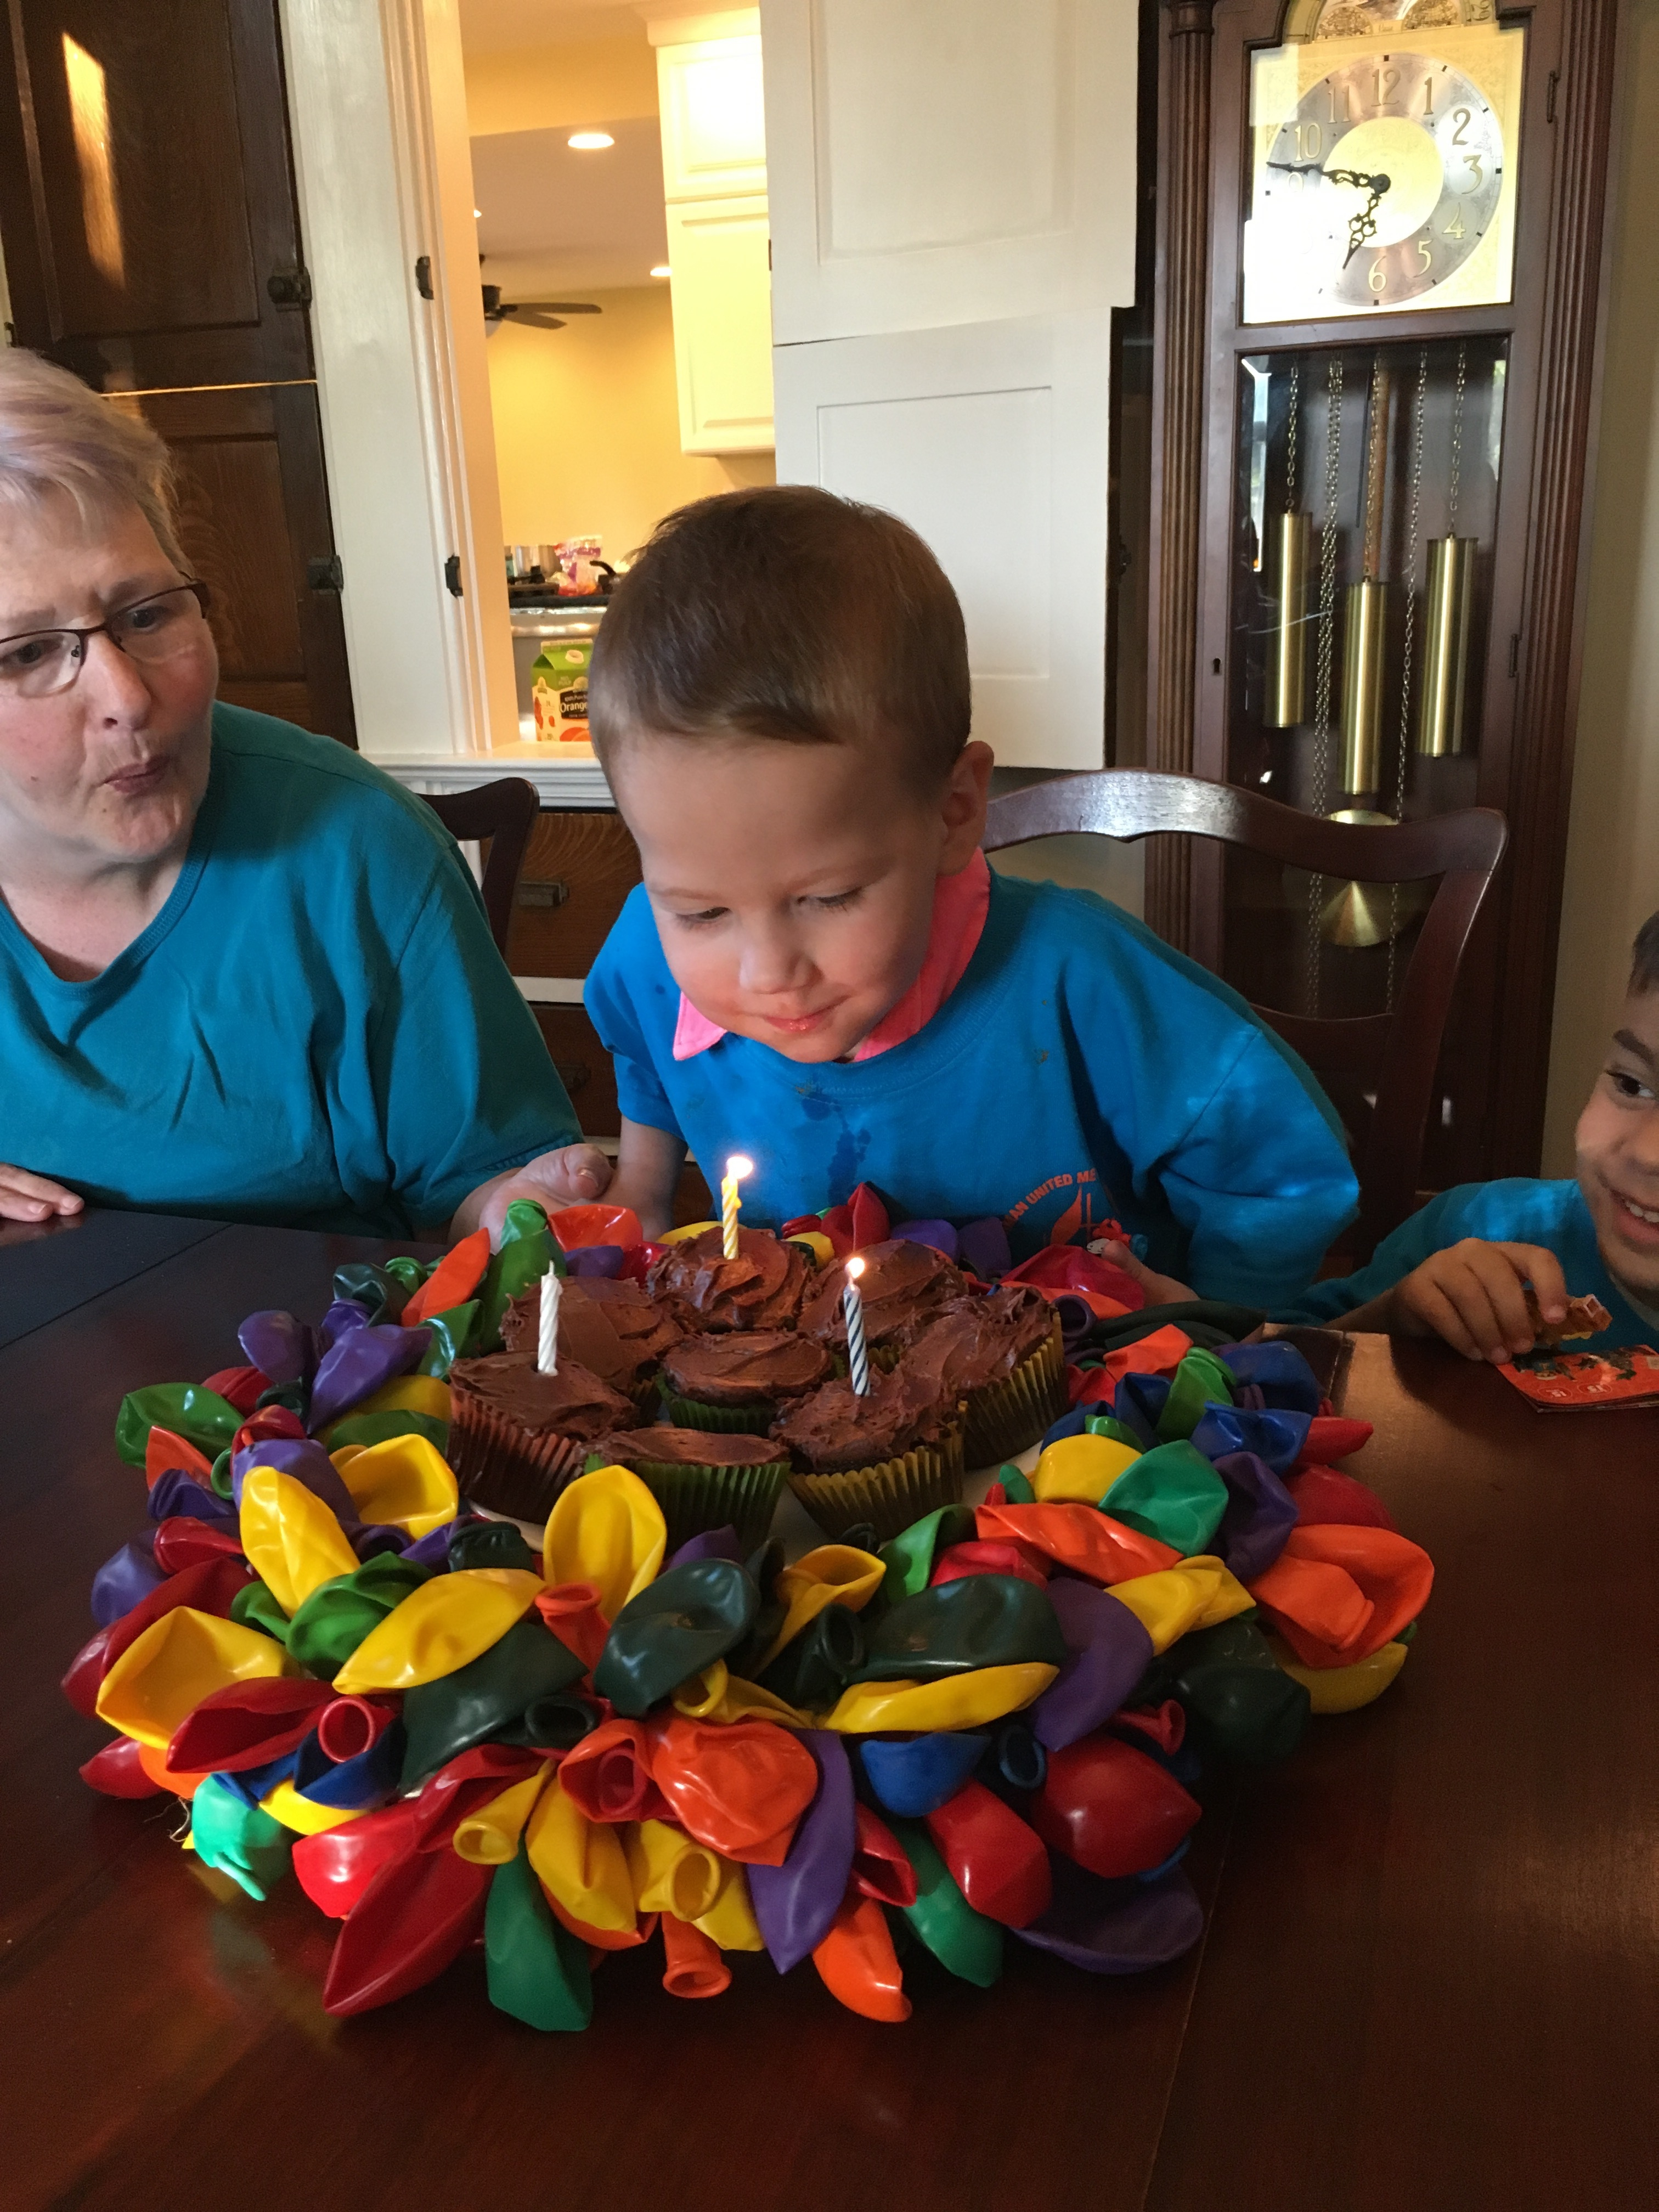 Three year old boy birthday celebration.